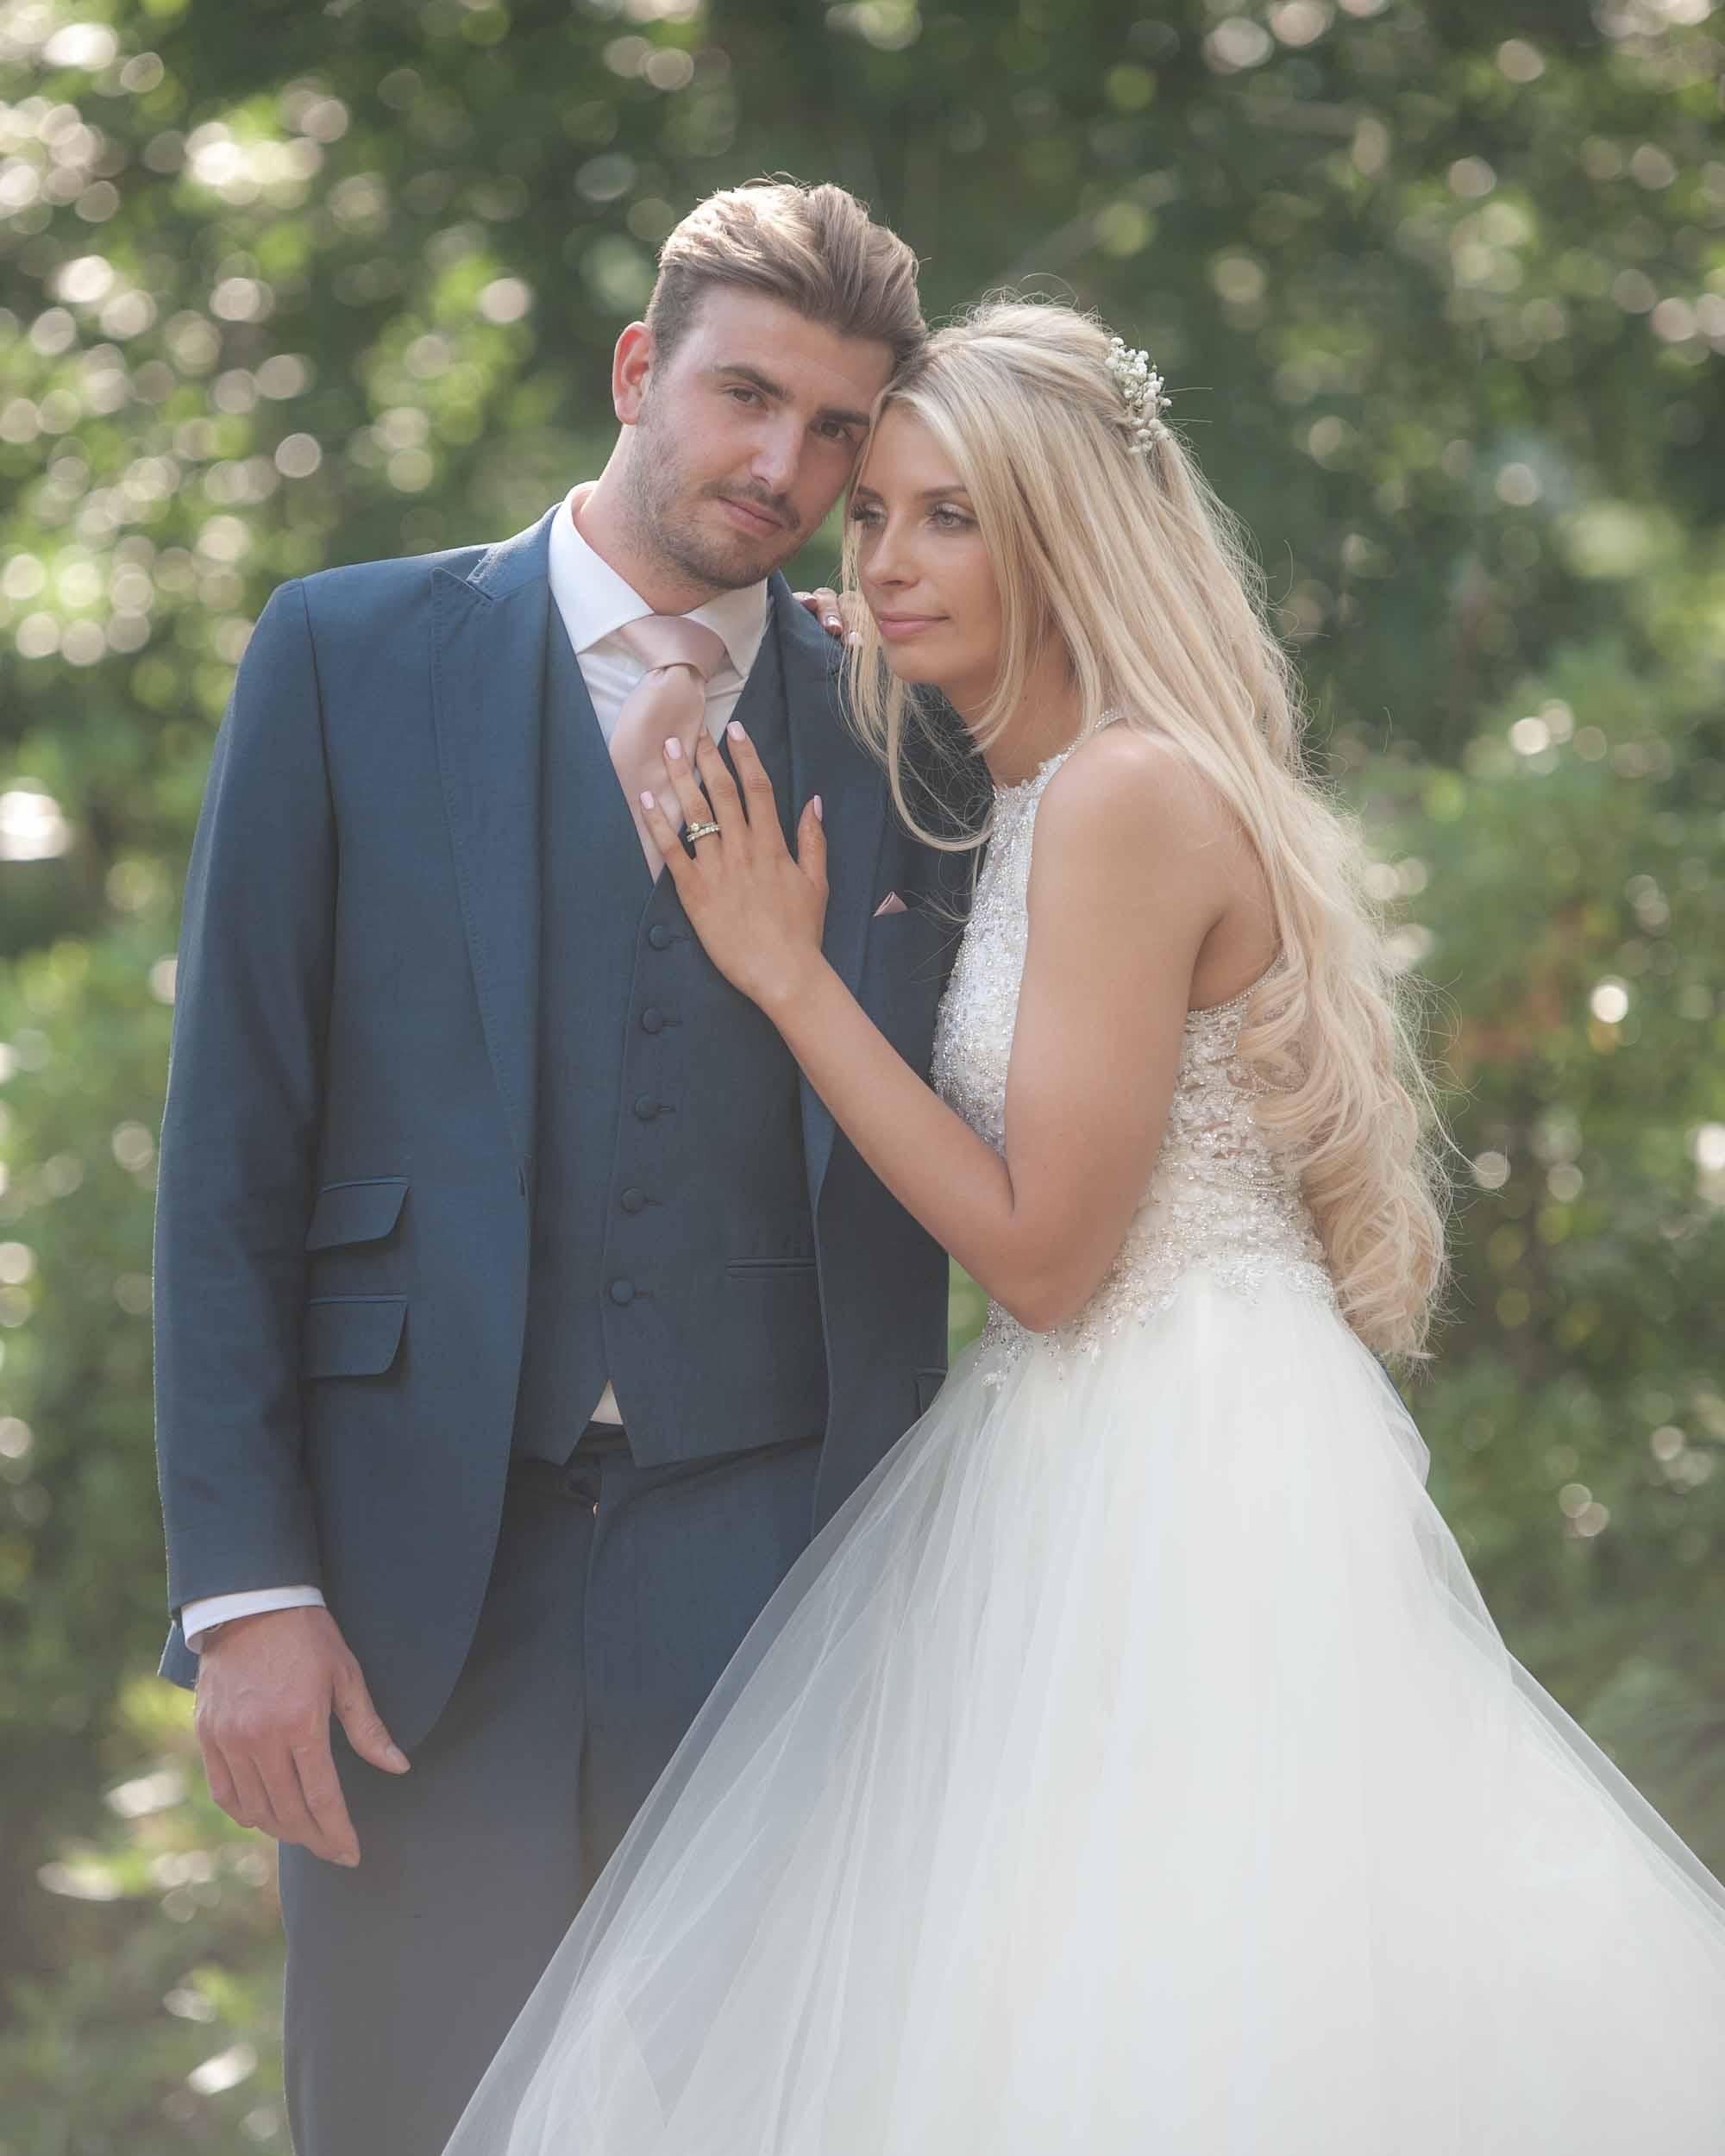 Emma&Victorwedding_0079_edited-1